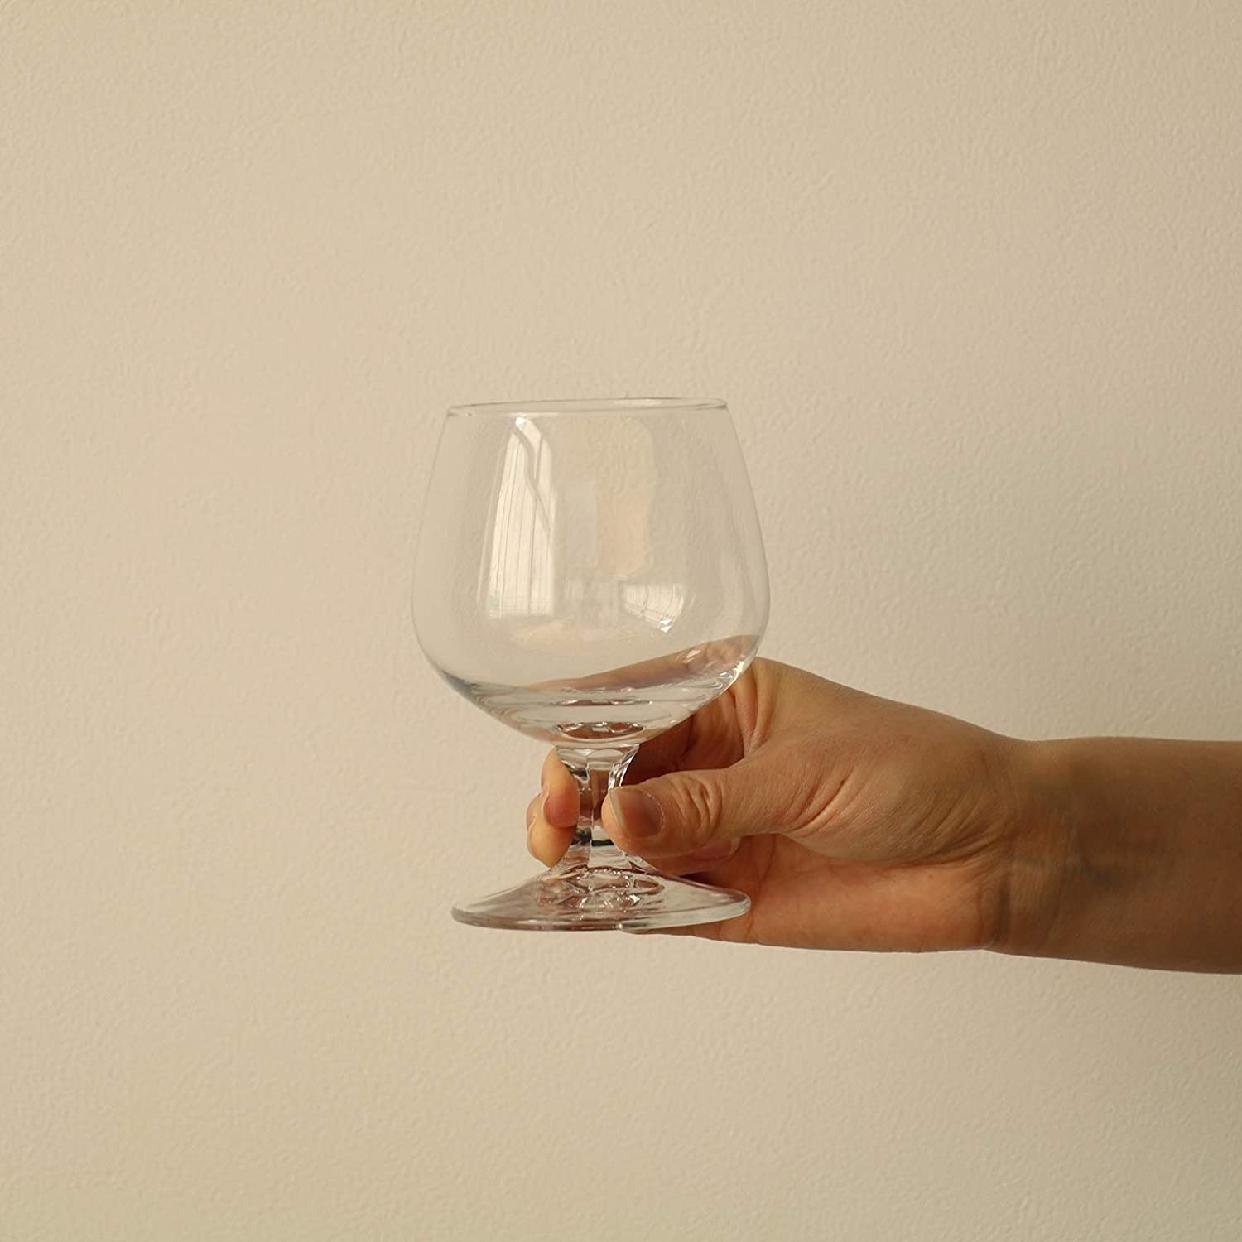 ADERIA(アデリア)ブランデーグラス 330ml Aライン 679の商品画像4